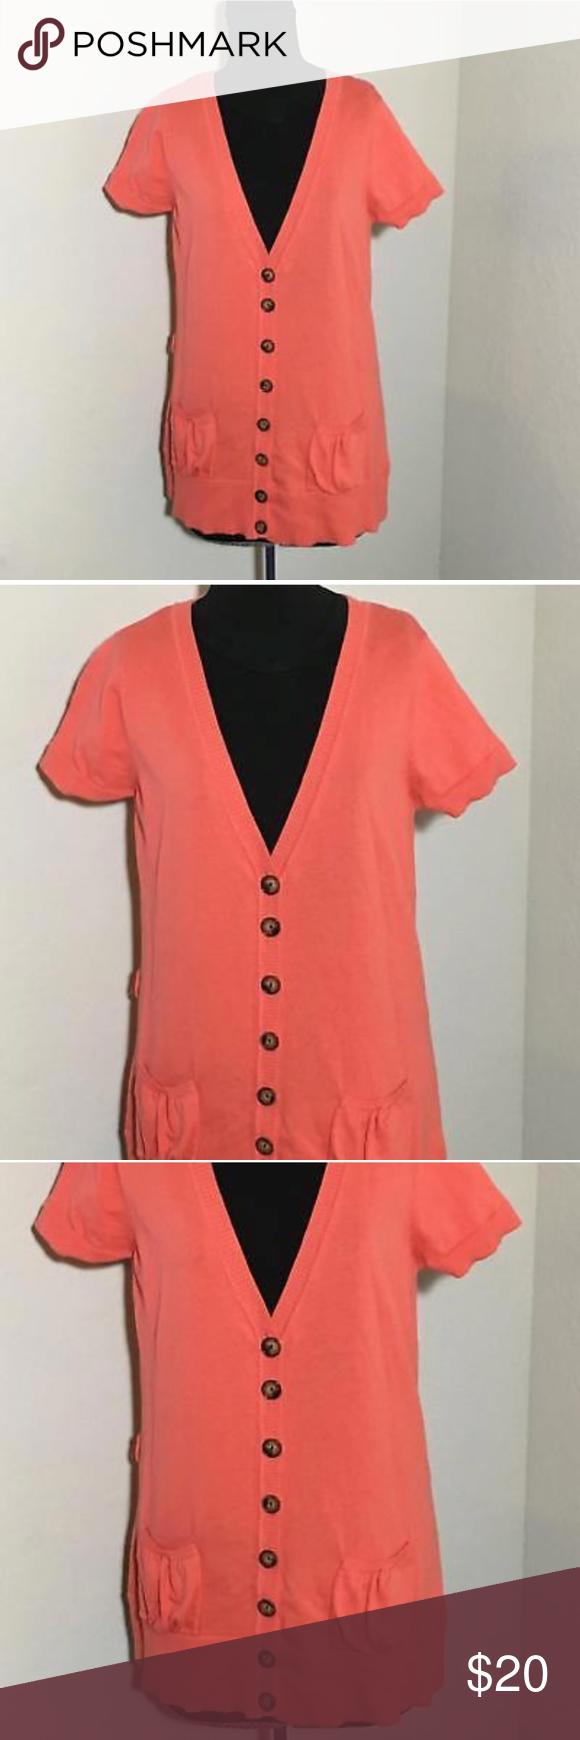 ALYX Cardigan Sweater Short Sleeve Coral Sz XL Women's ALYX coral ...